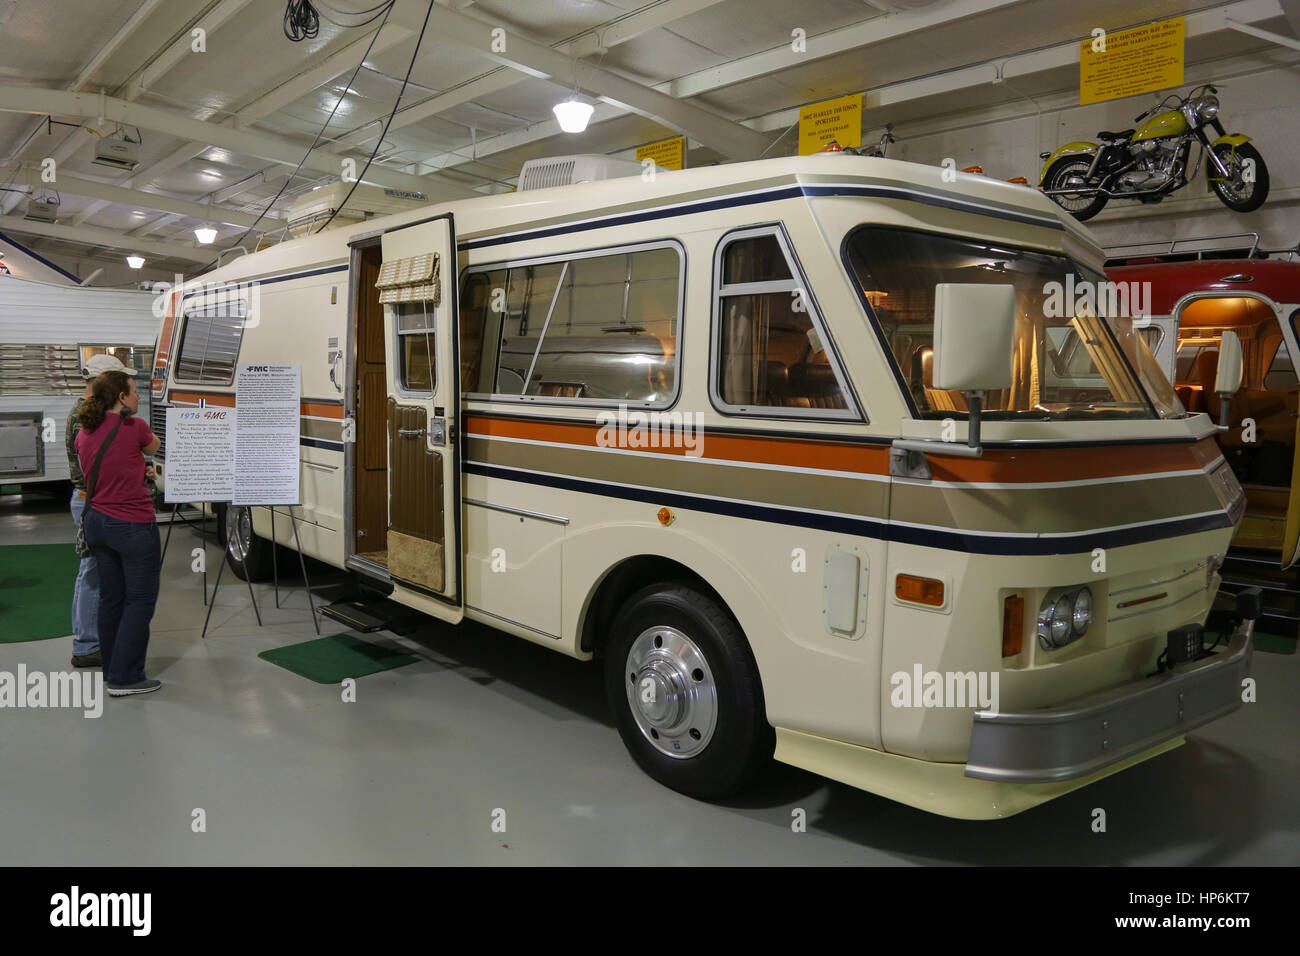 1976 FMC Motorhome at Jack Sisemore Traveland RV Museum - Stock Image